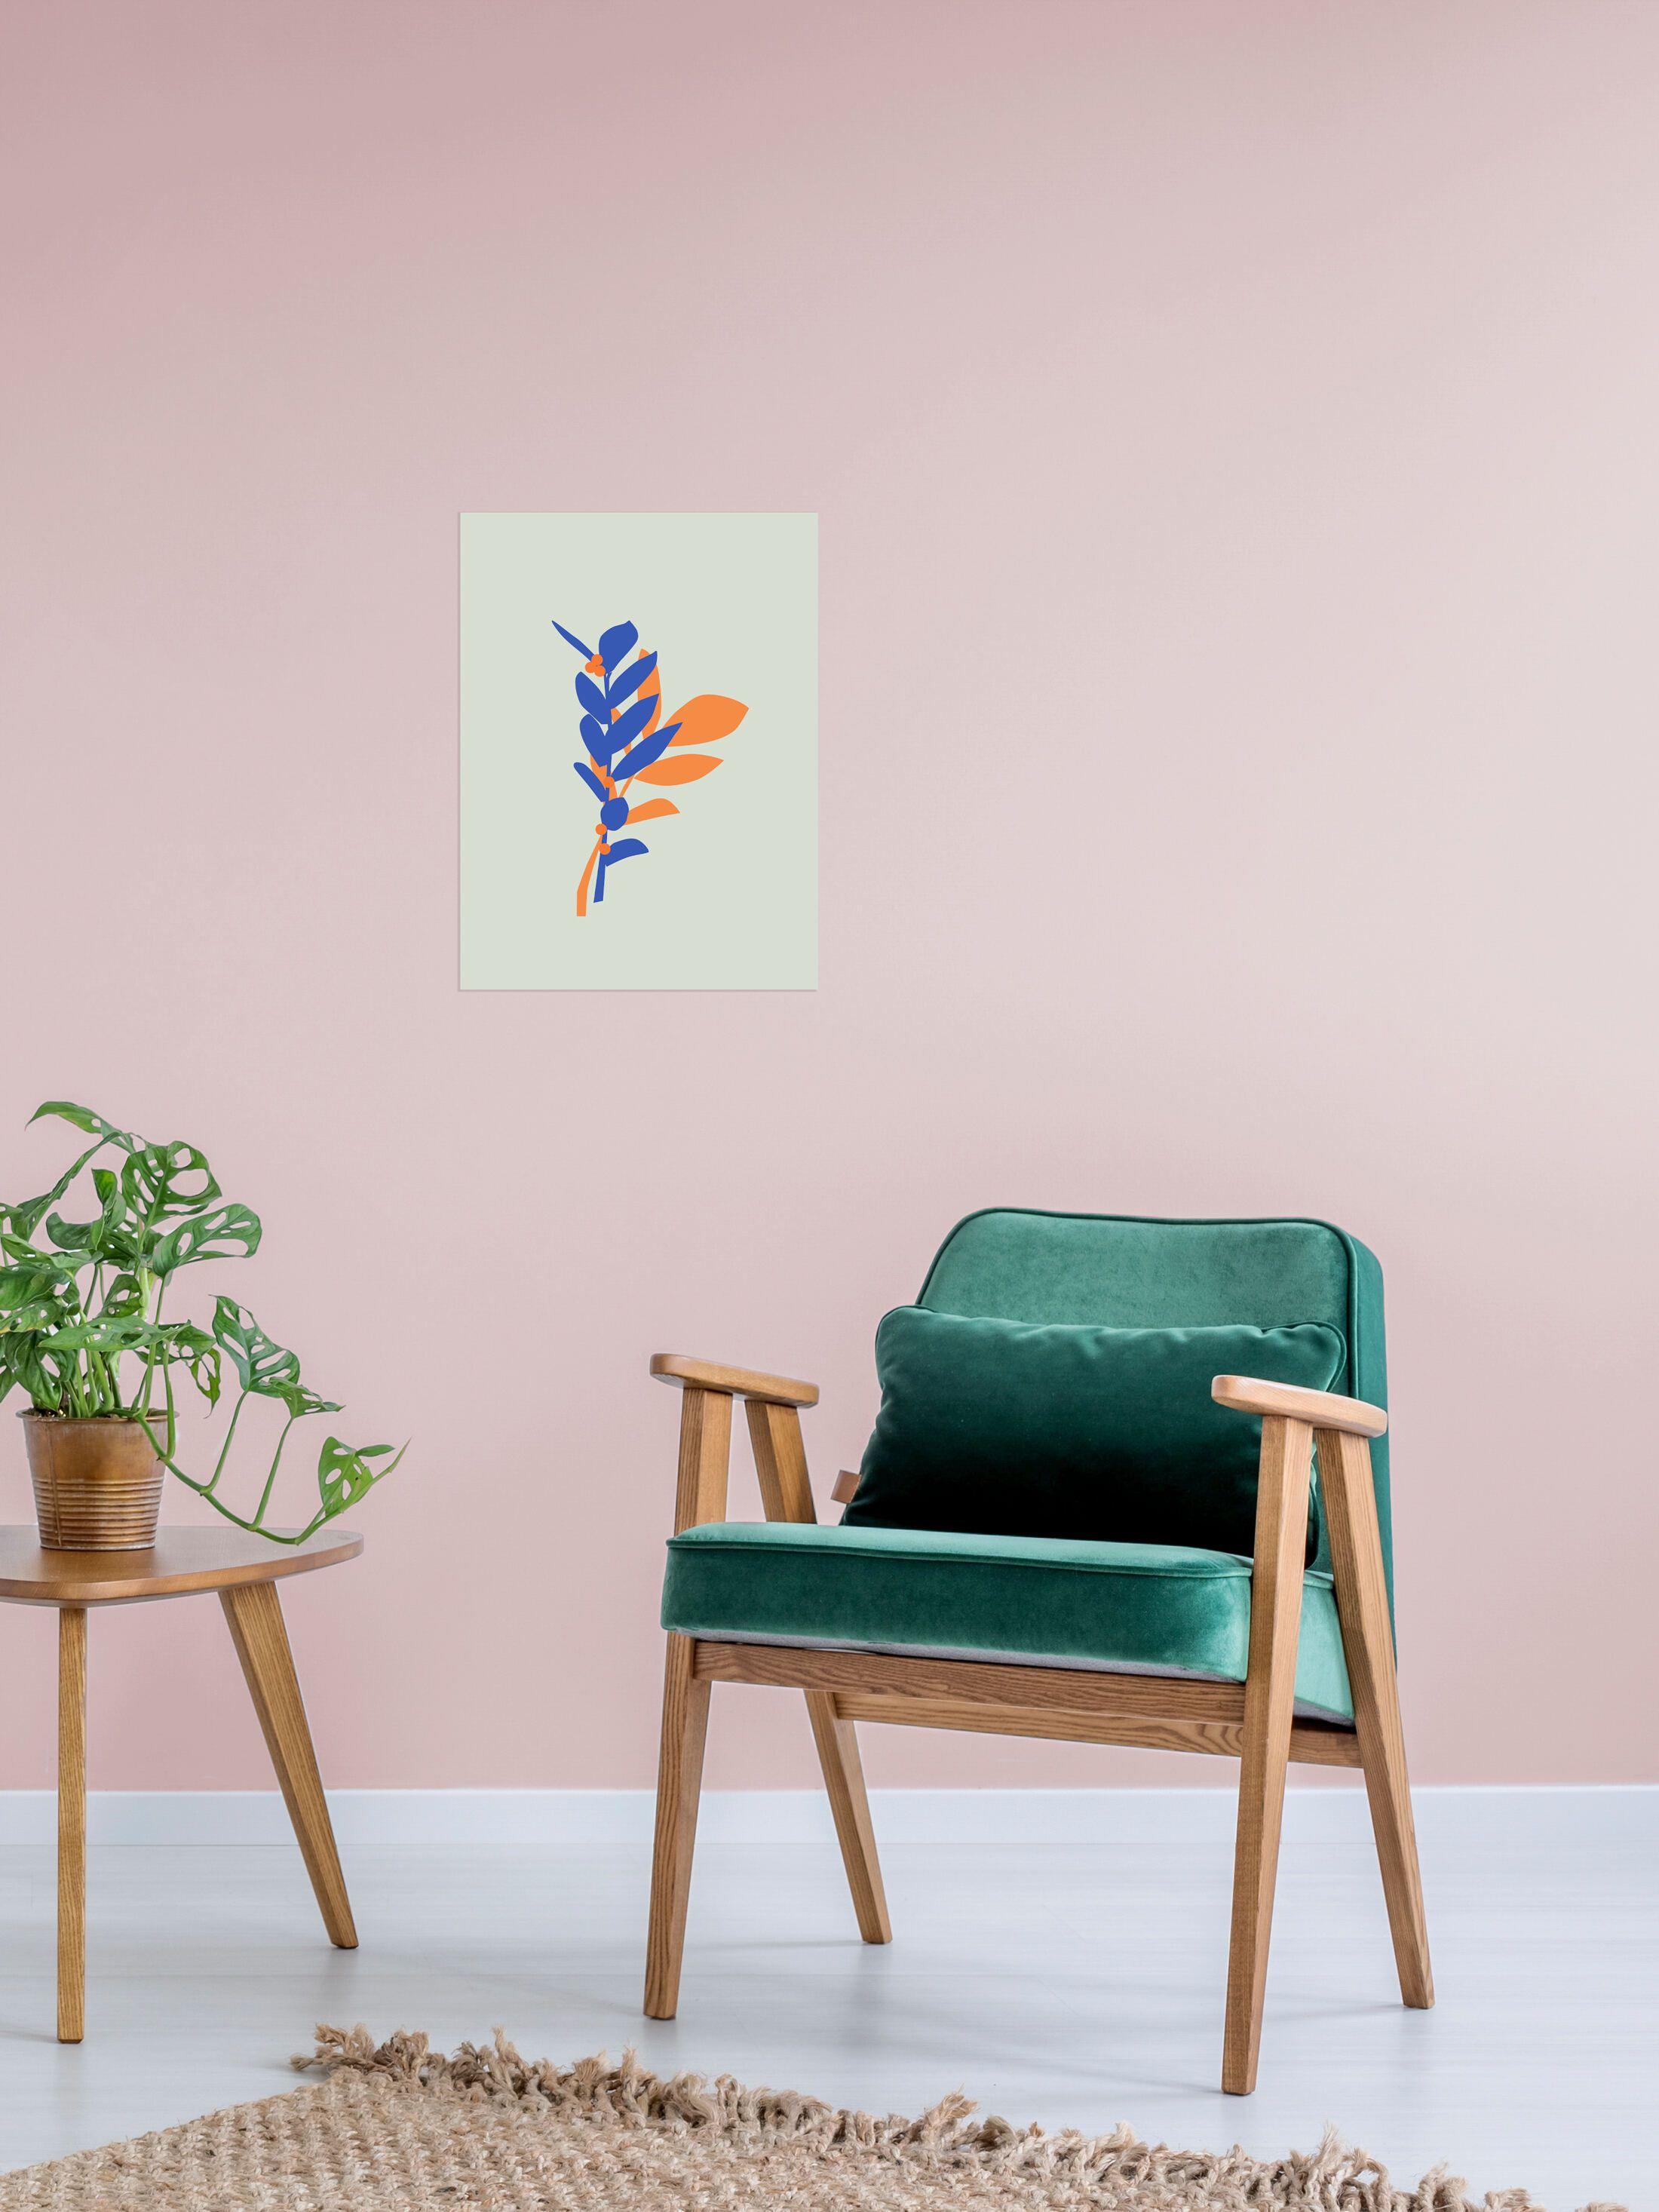 my art as wall print